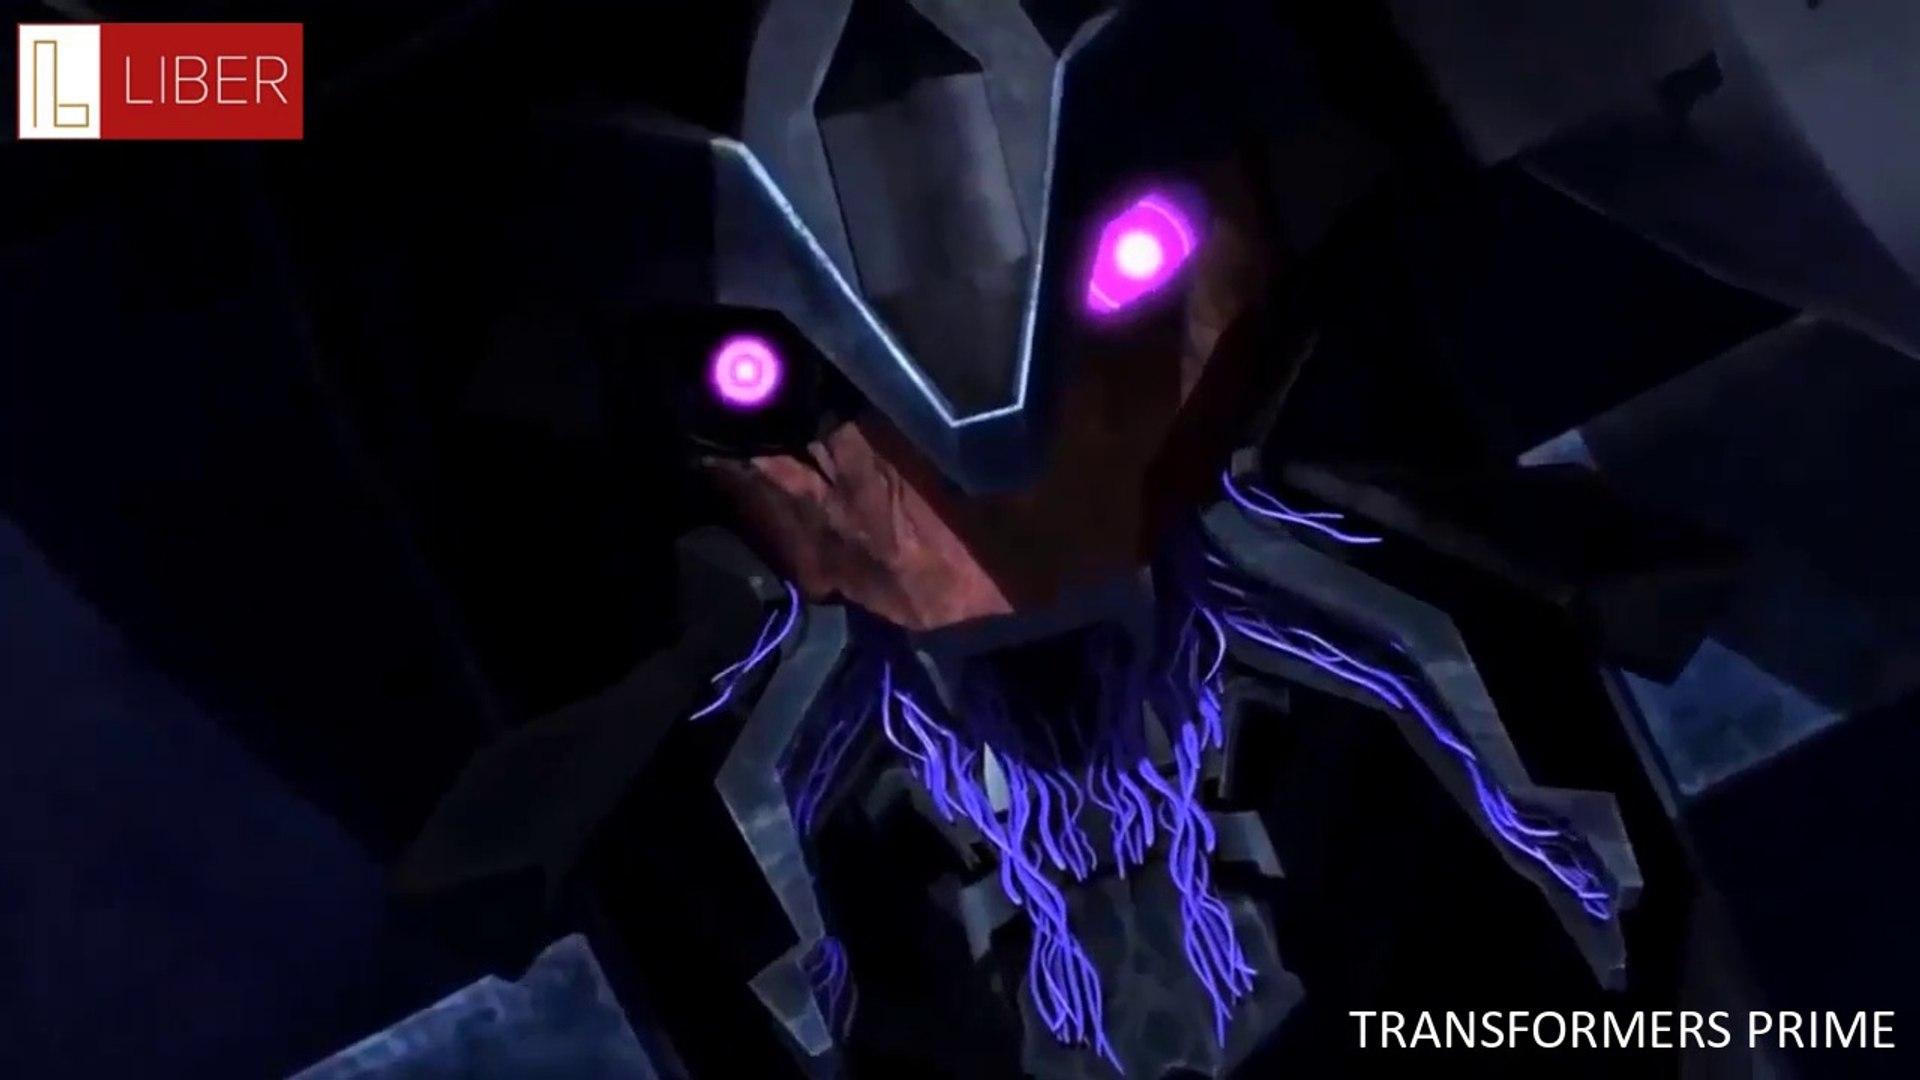 Transformers Prime 60.Bölüm Susuzluk Full Hd